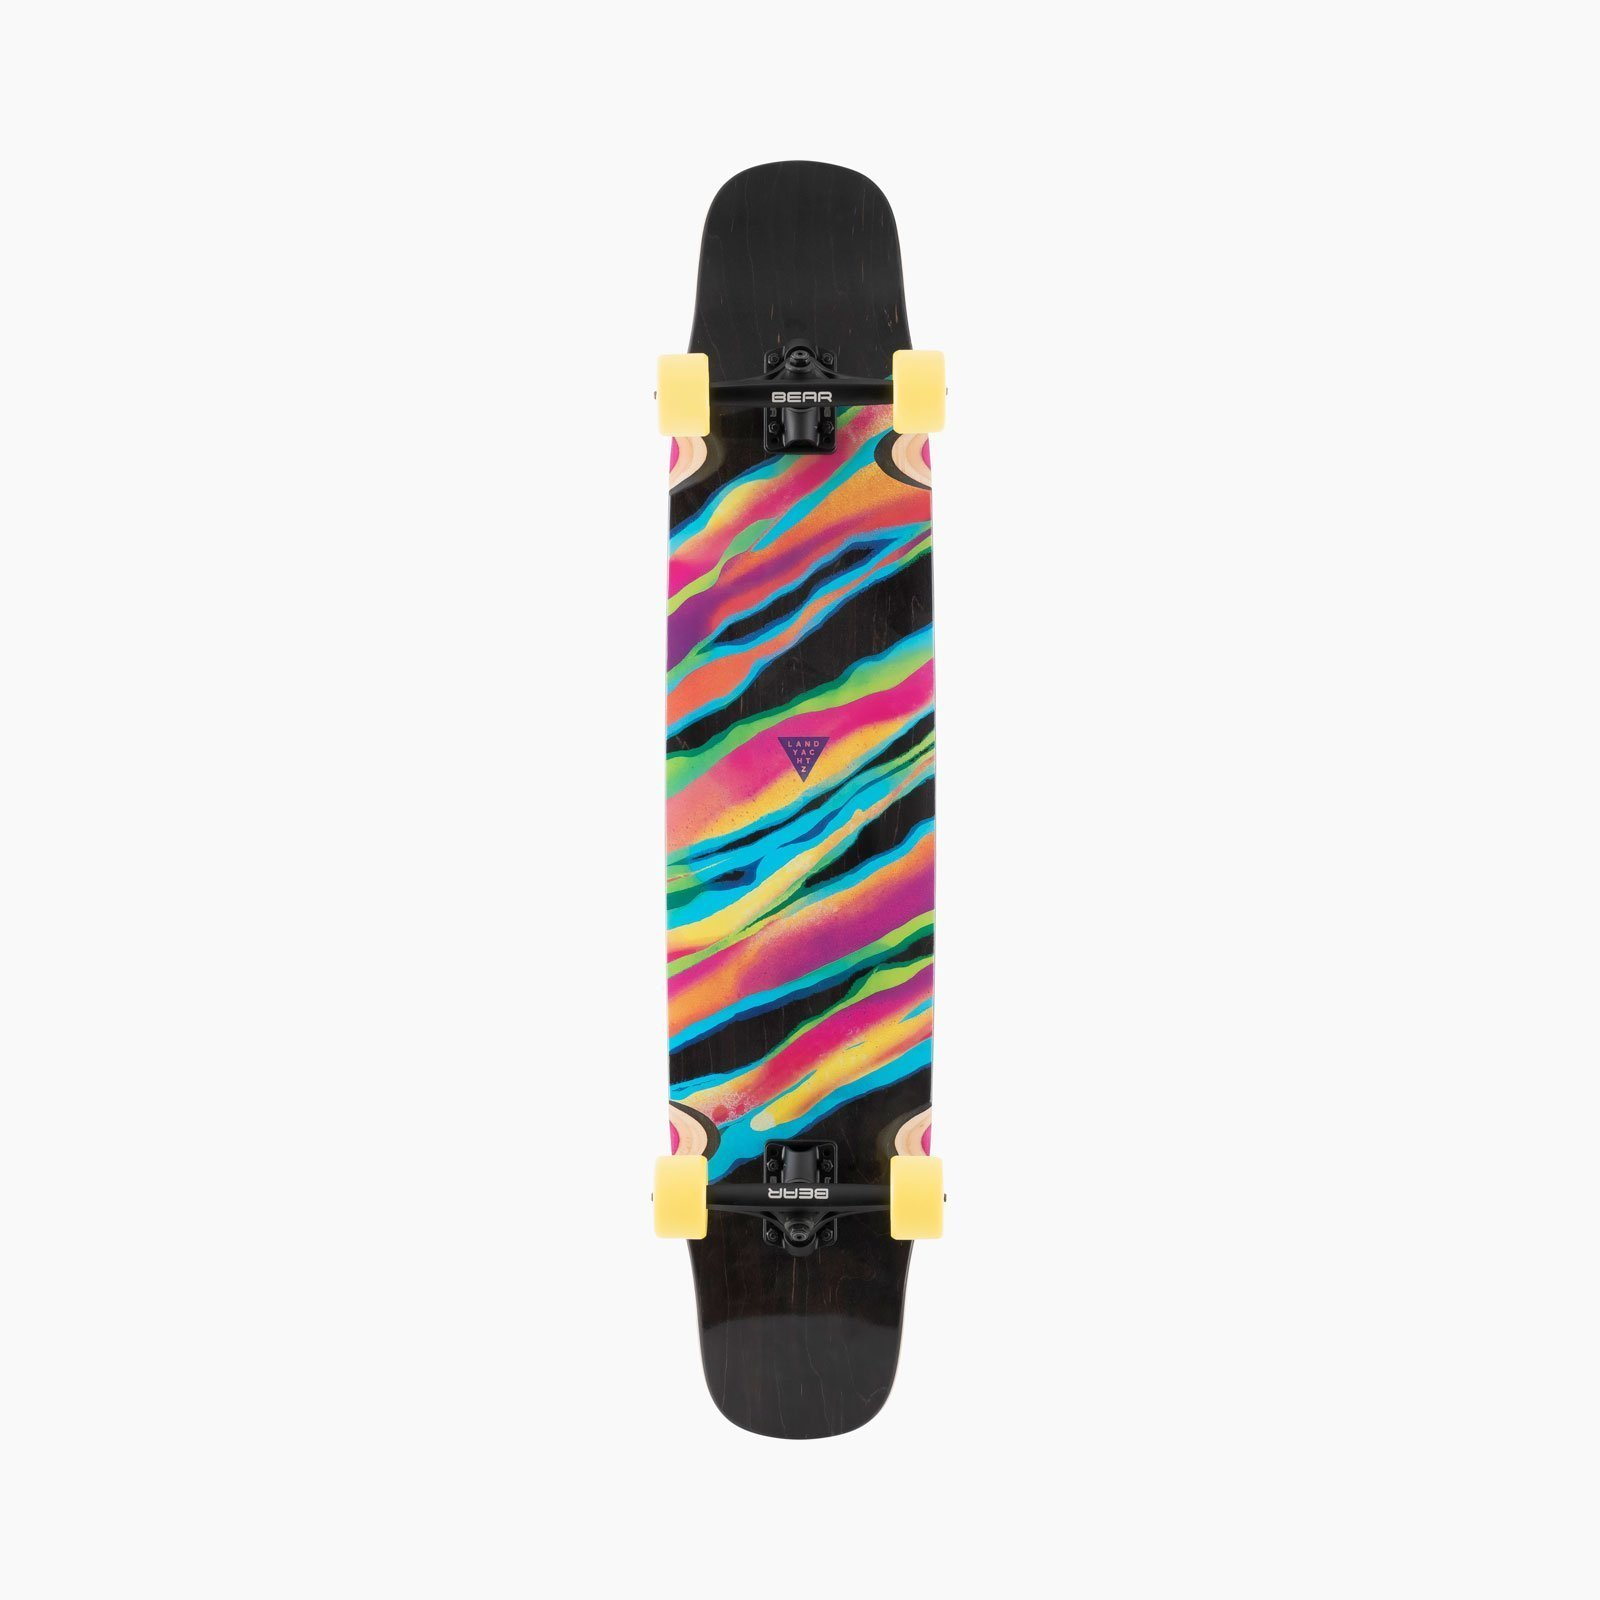 Landyachtz Stratus Spectrum Longboard Complete